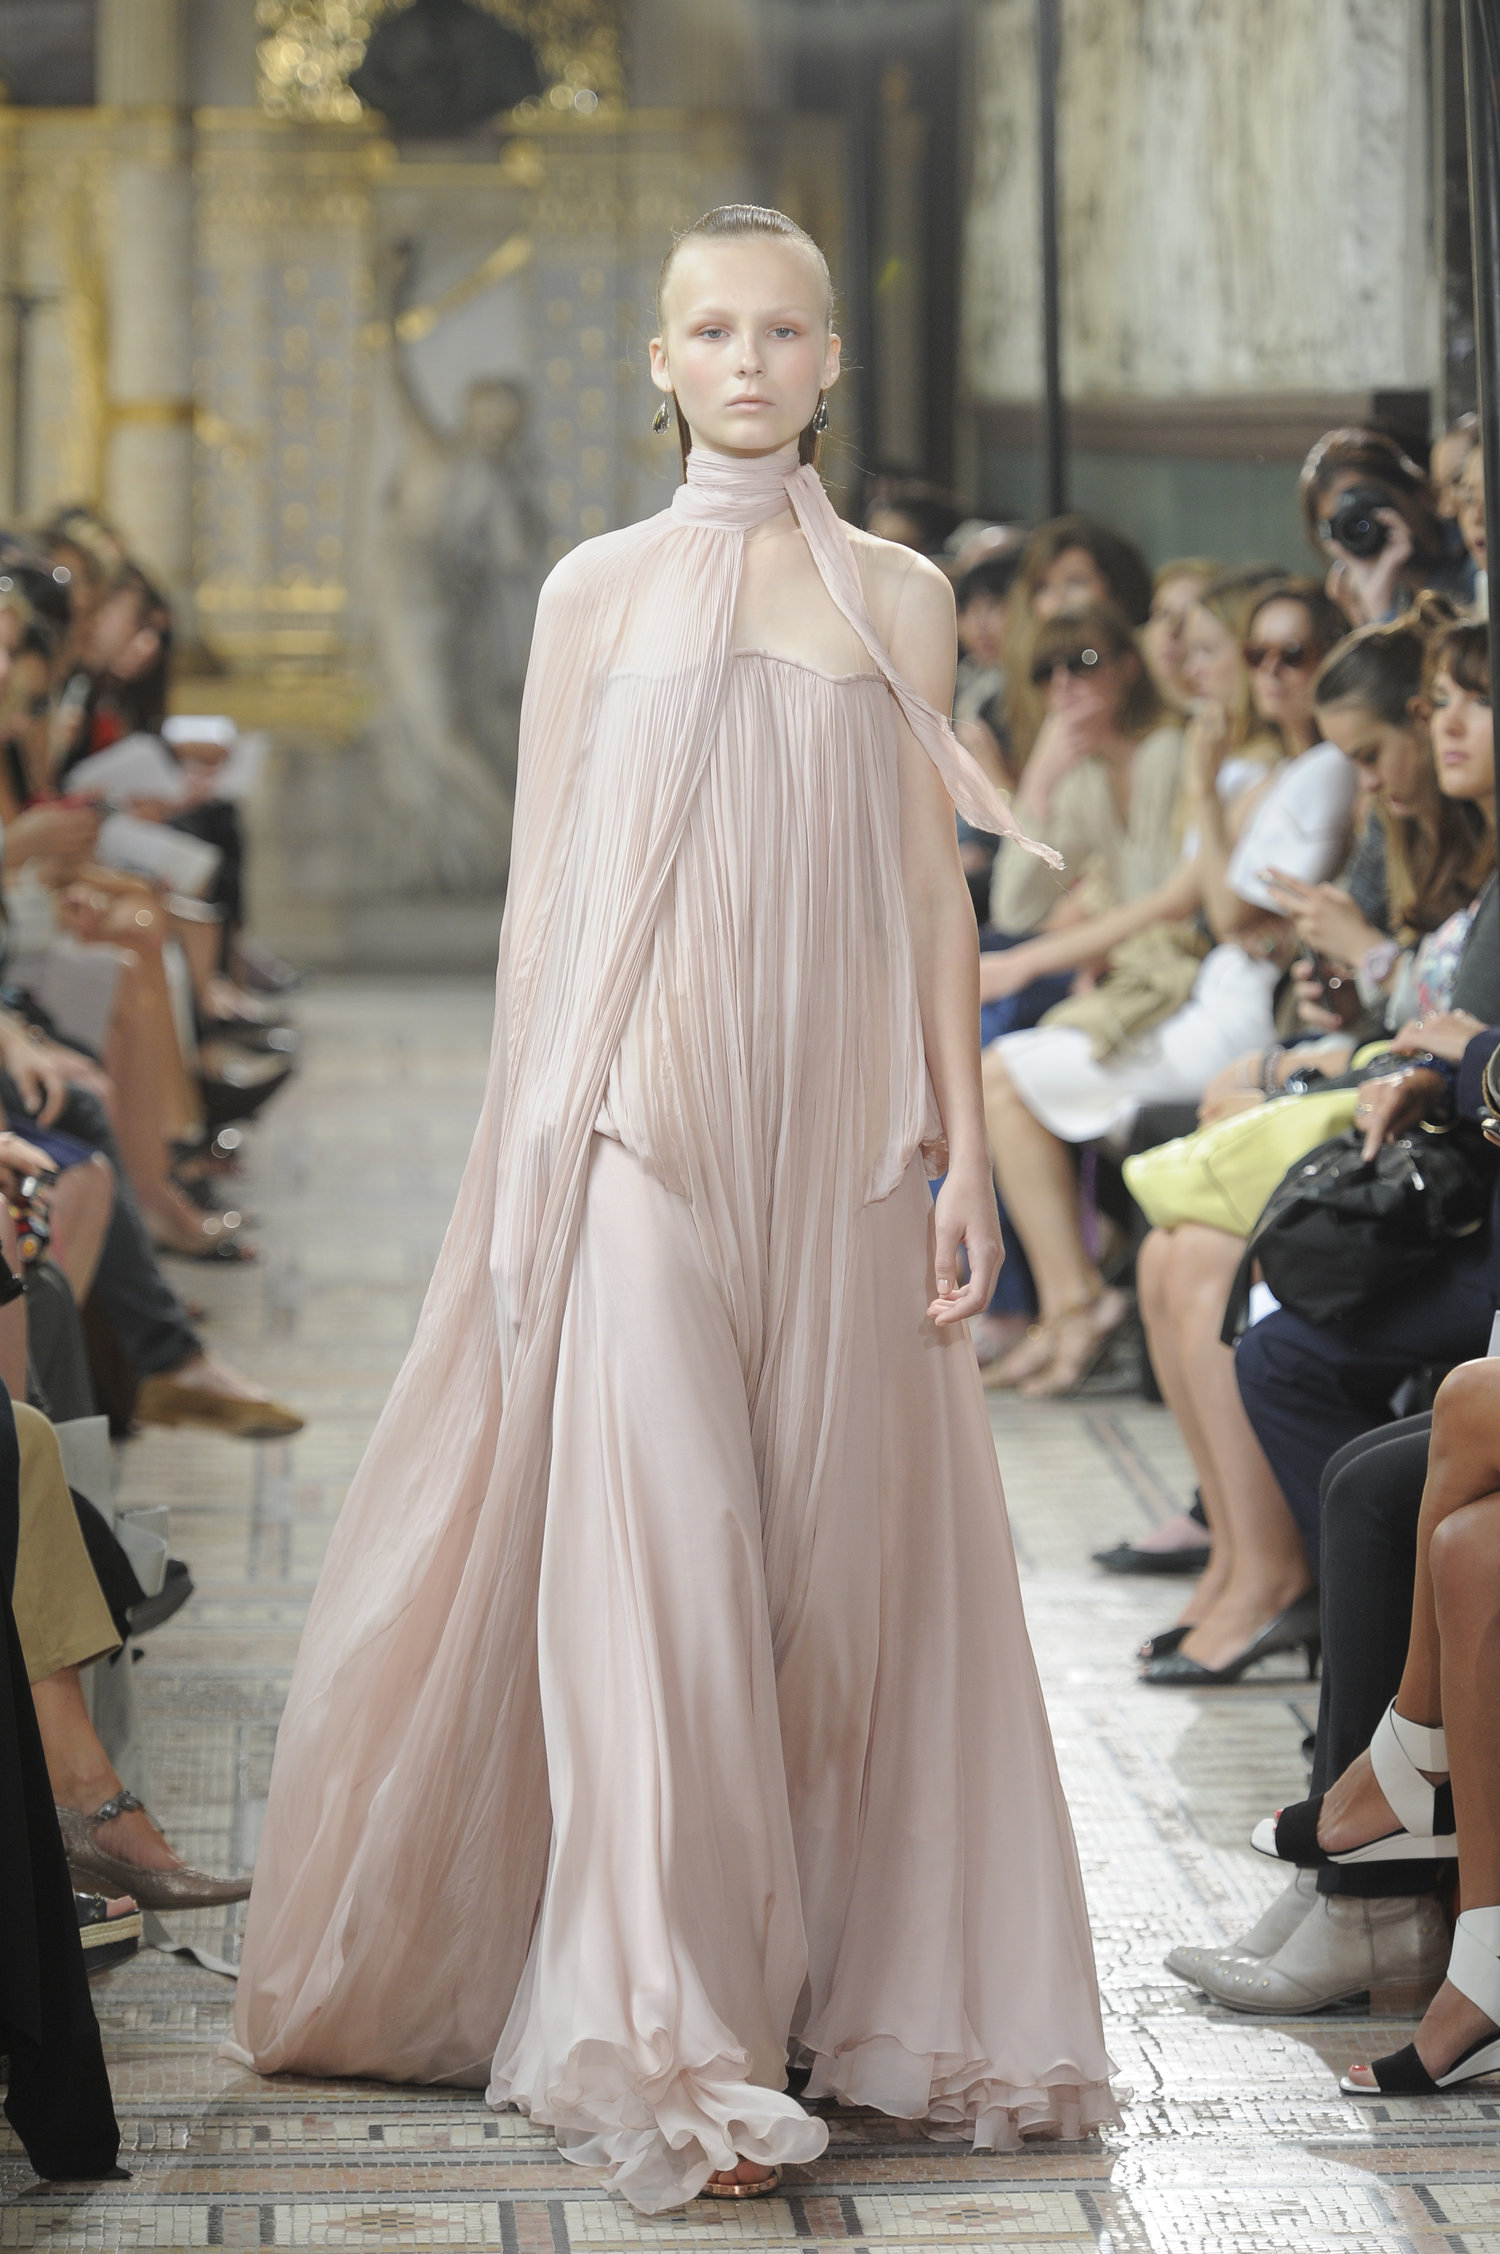 christophe-josse-couture-fw13-14-look-17.jpg